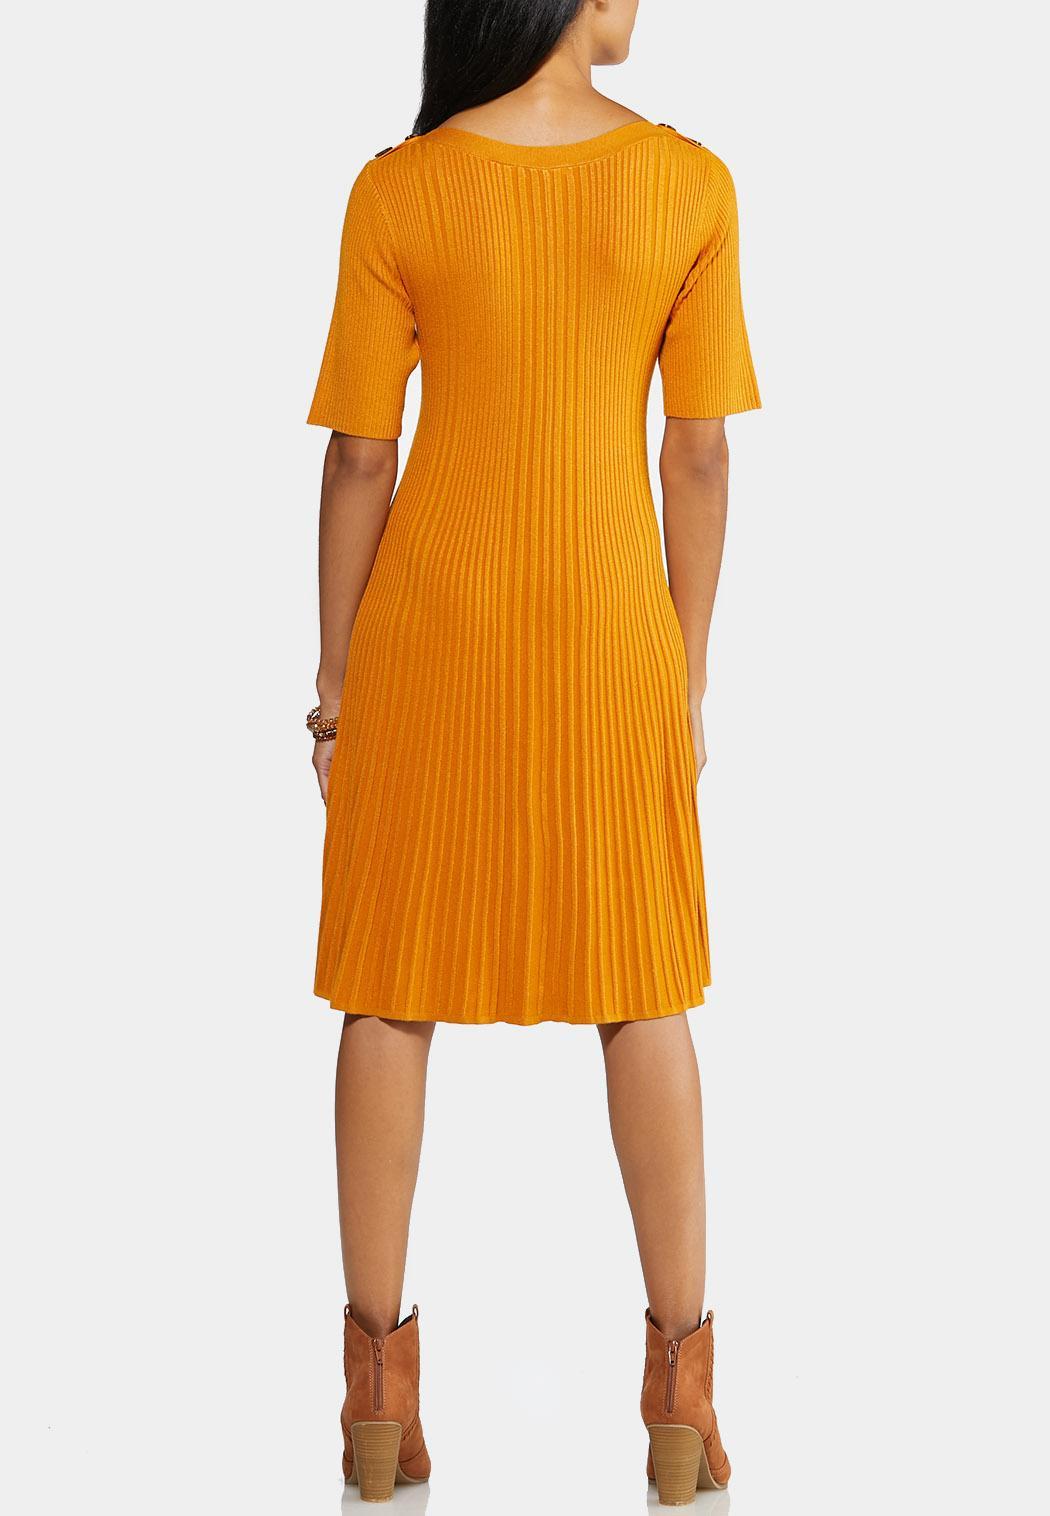 Plus Size Ribbed Sweater Dress (Item #43947653)